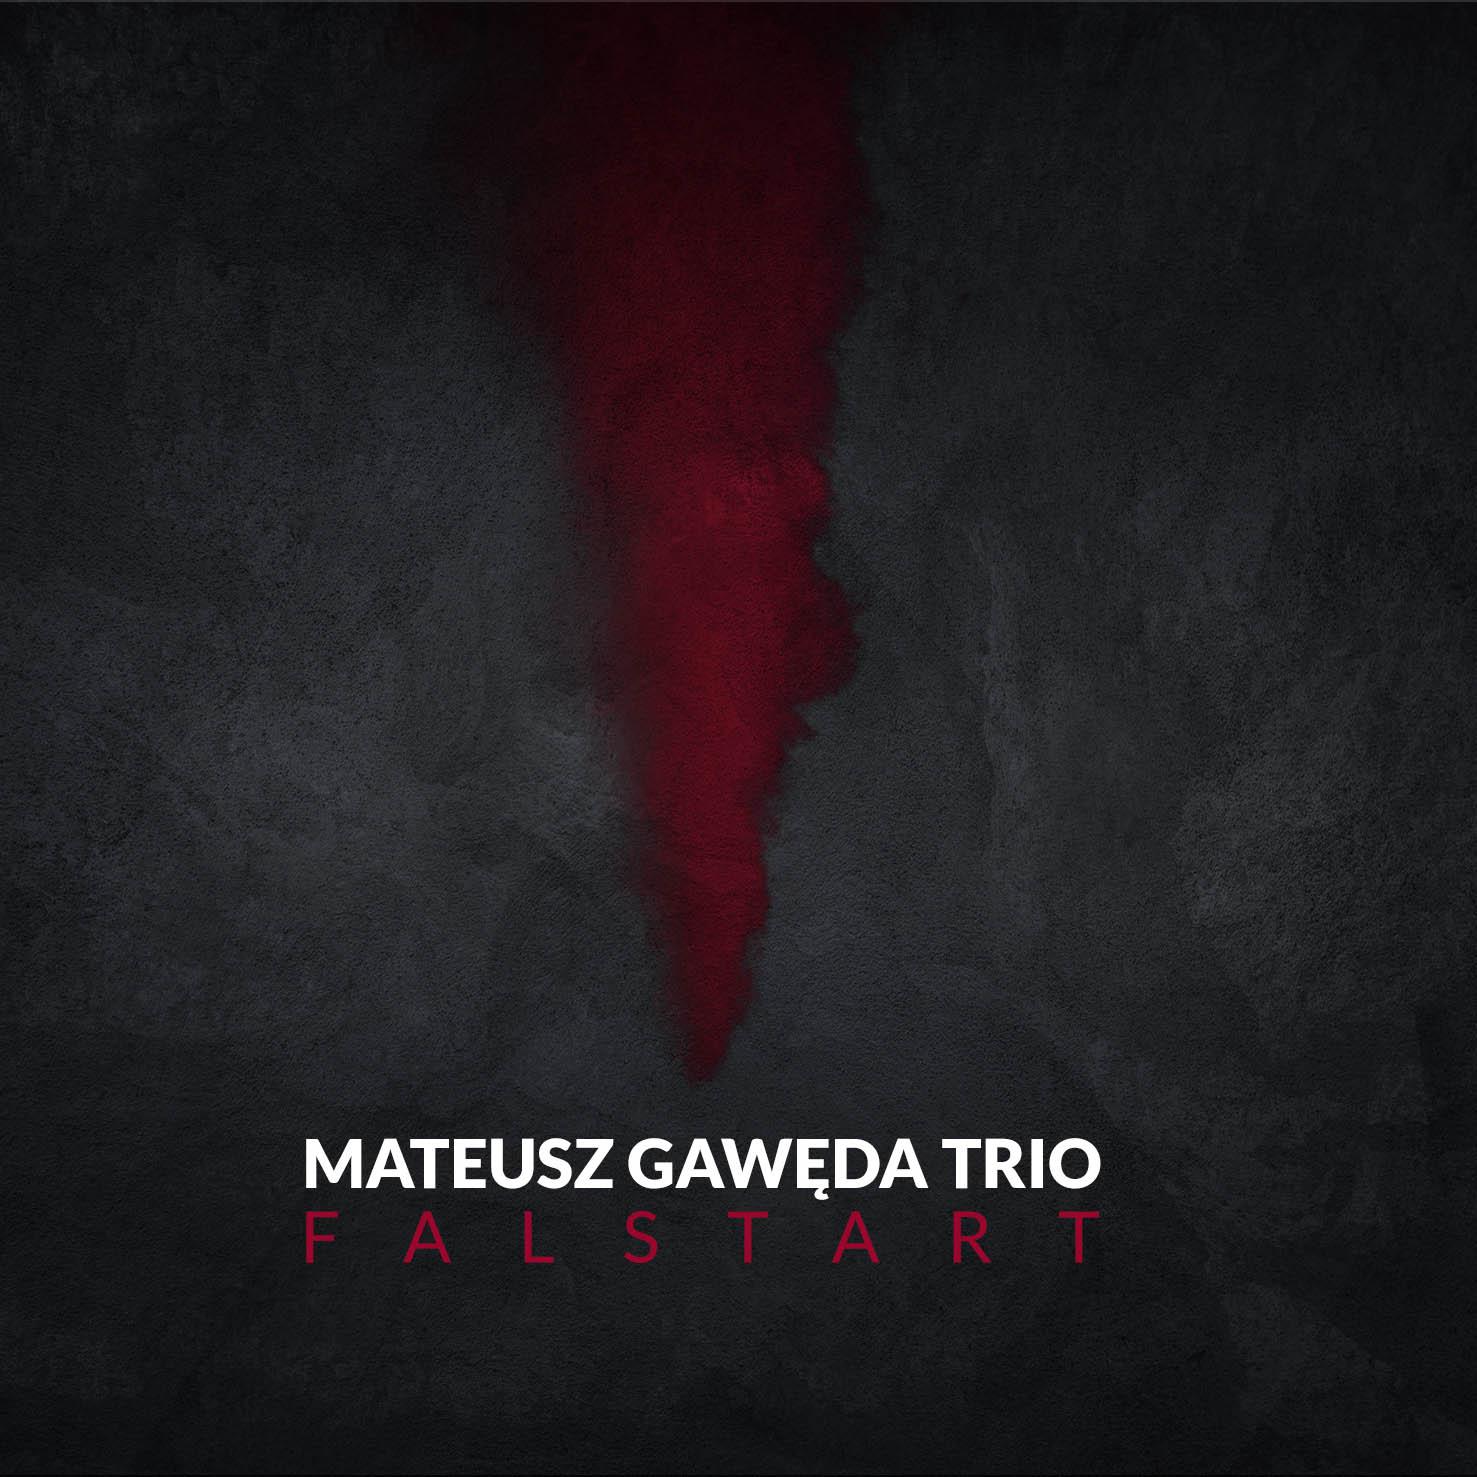 Mateusz Gaweda Trio Falstart cover